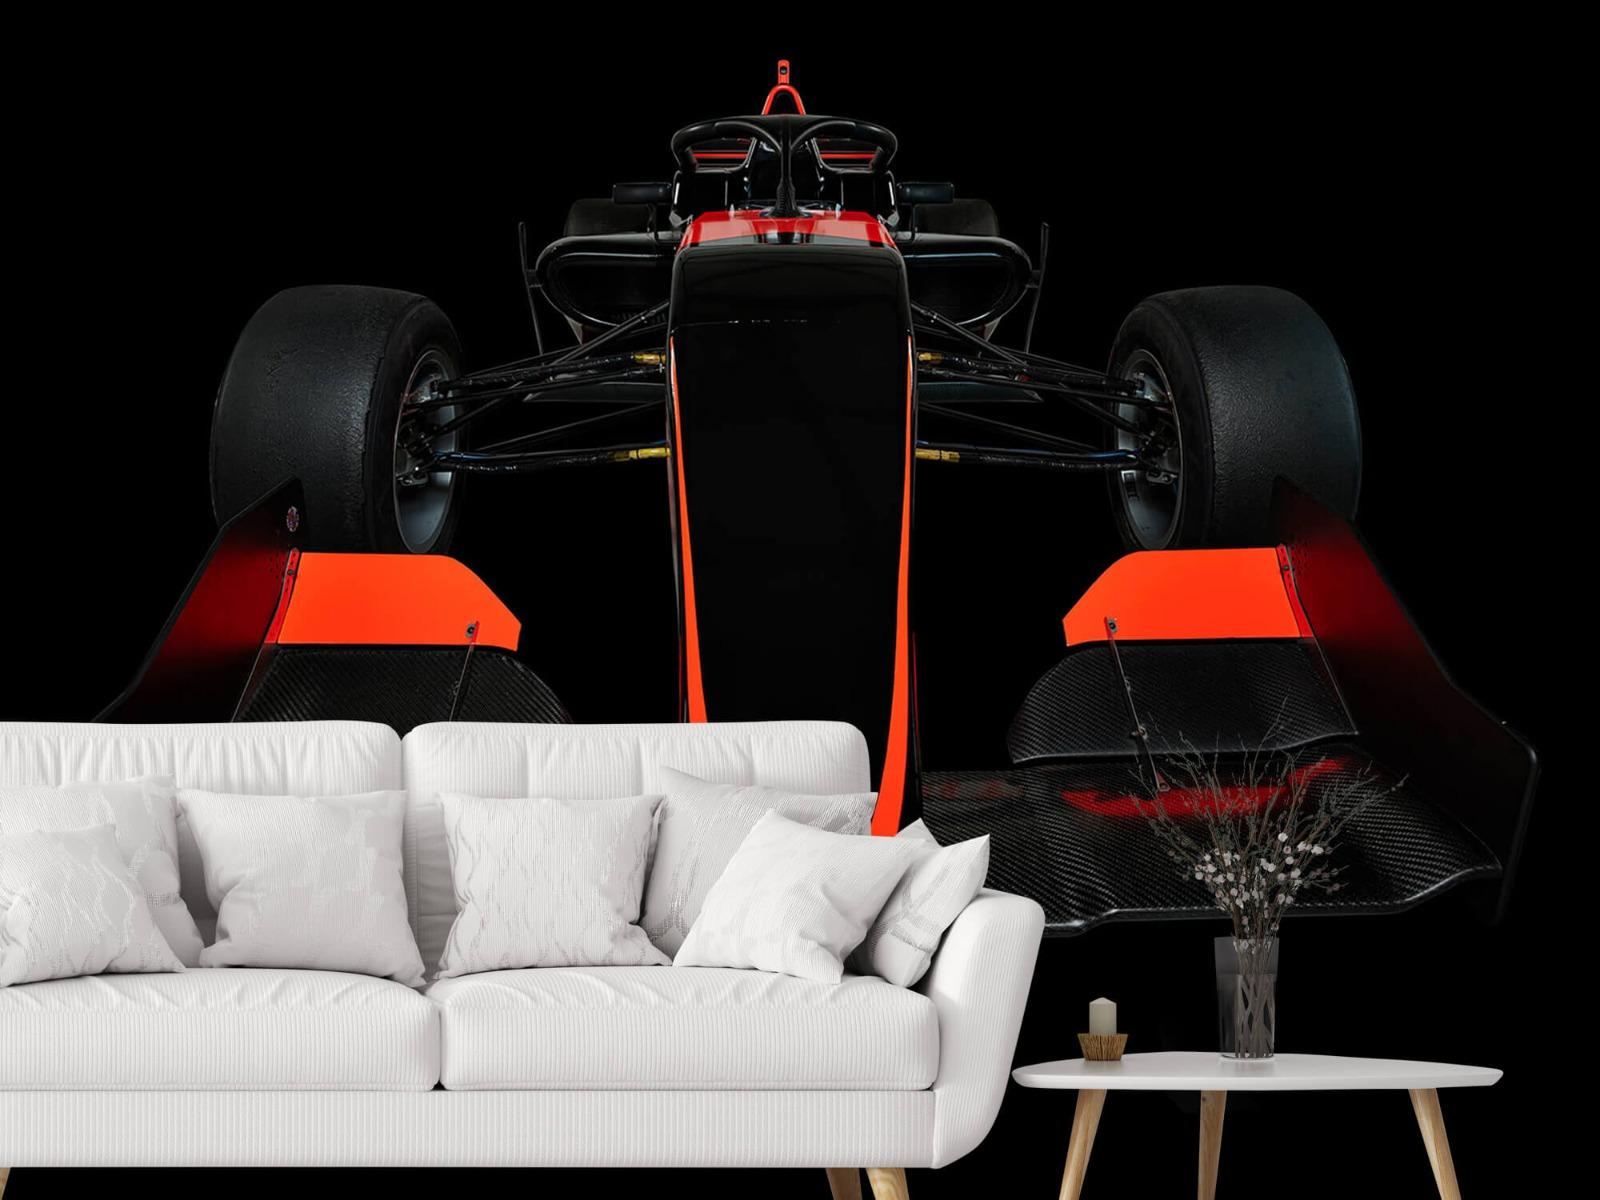 Sportauto's - Formule 3 - Lower front view - dark - Slaapkamer 3